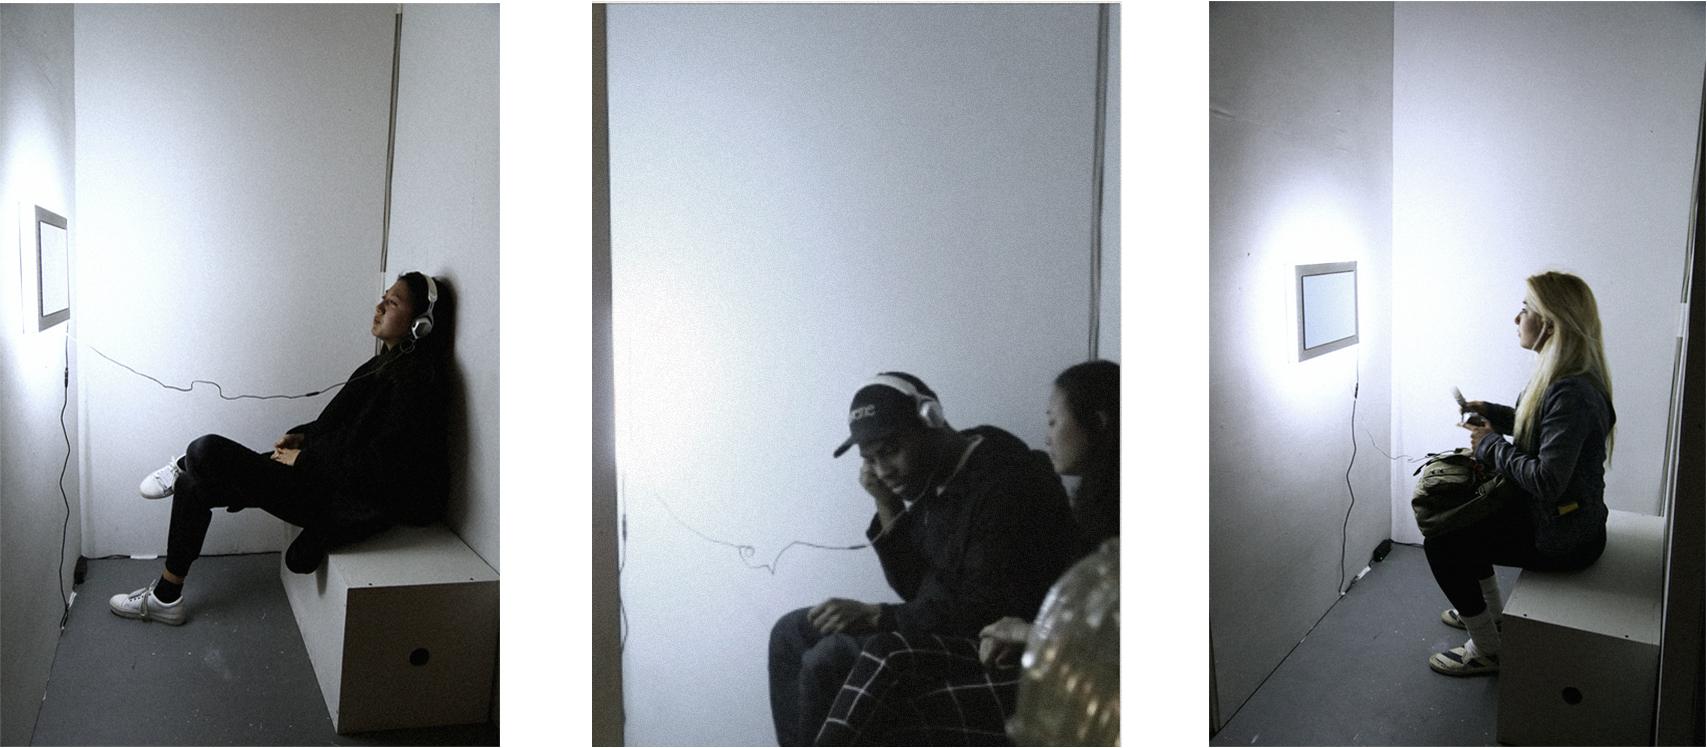 O    Audio Orgasm, Headphones, LED String-Light, Web-cam, One Way Mirror April 2015